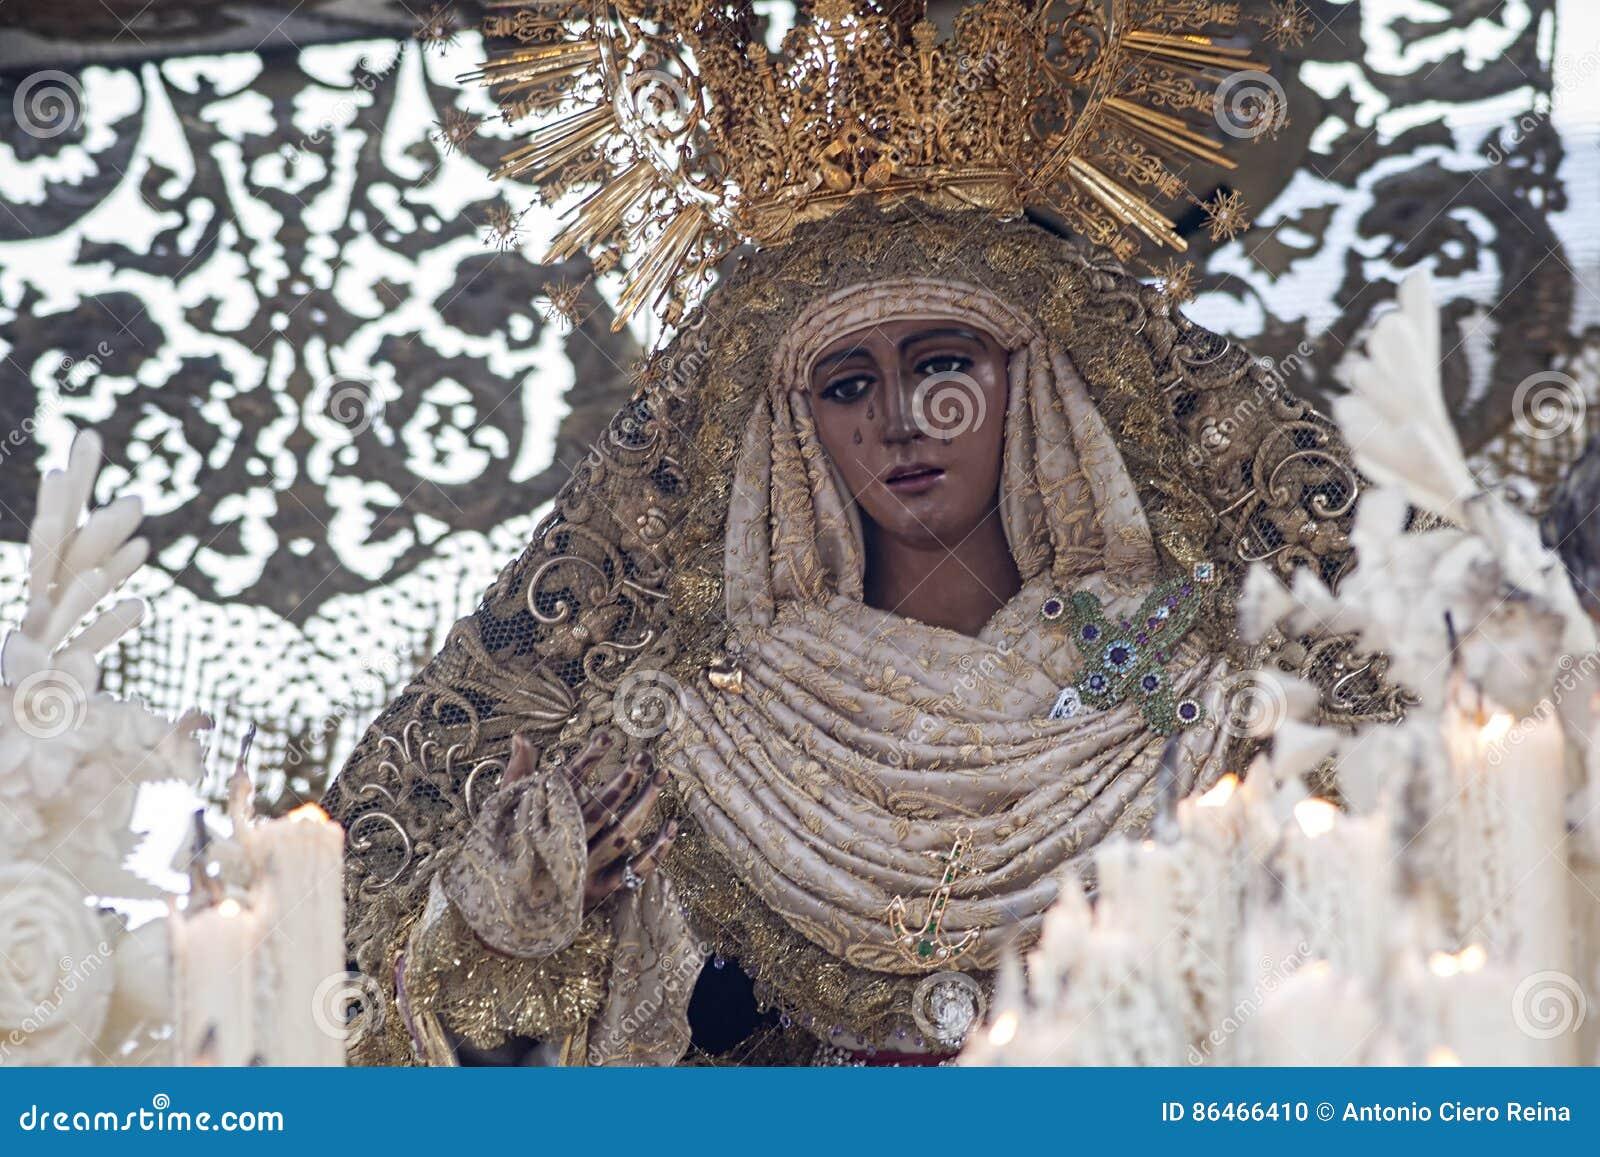 Virgenen de la esperanza de Triana, helig vecka i Seville